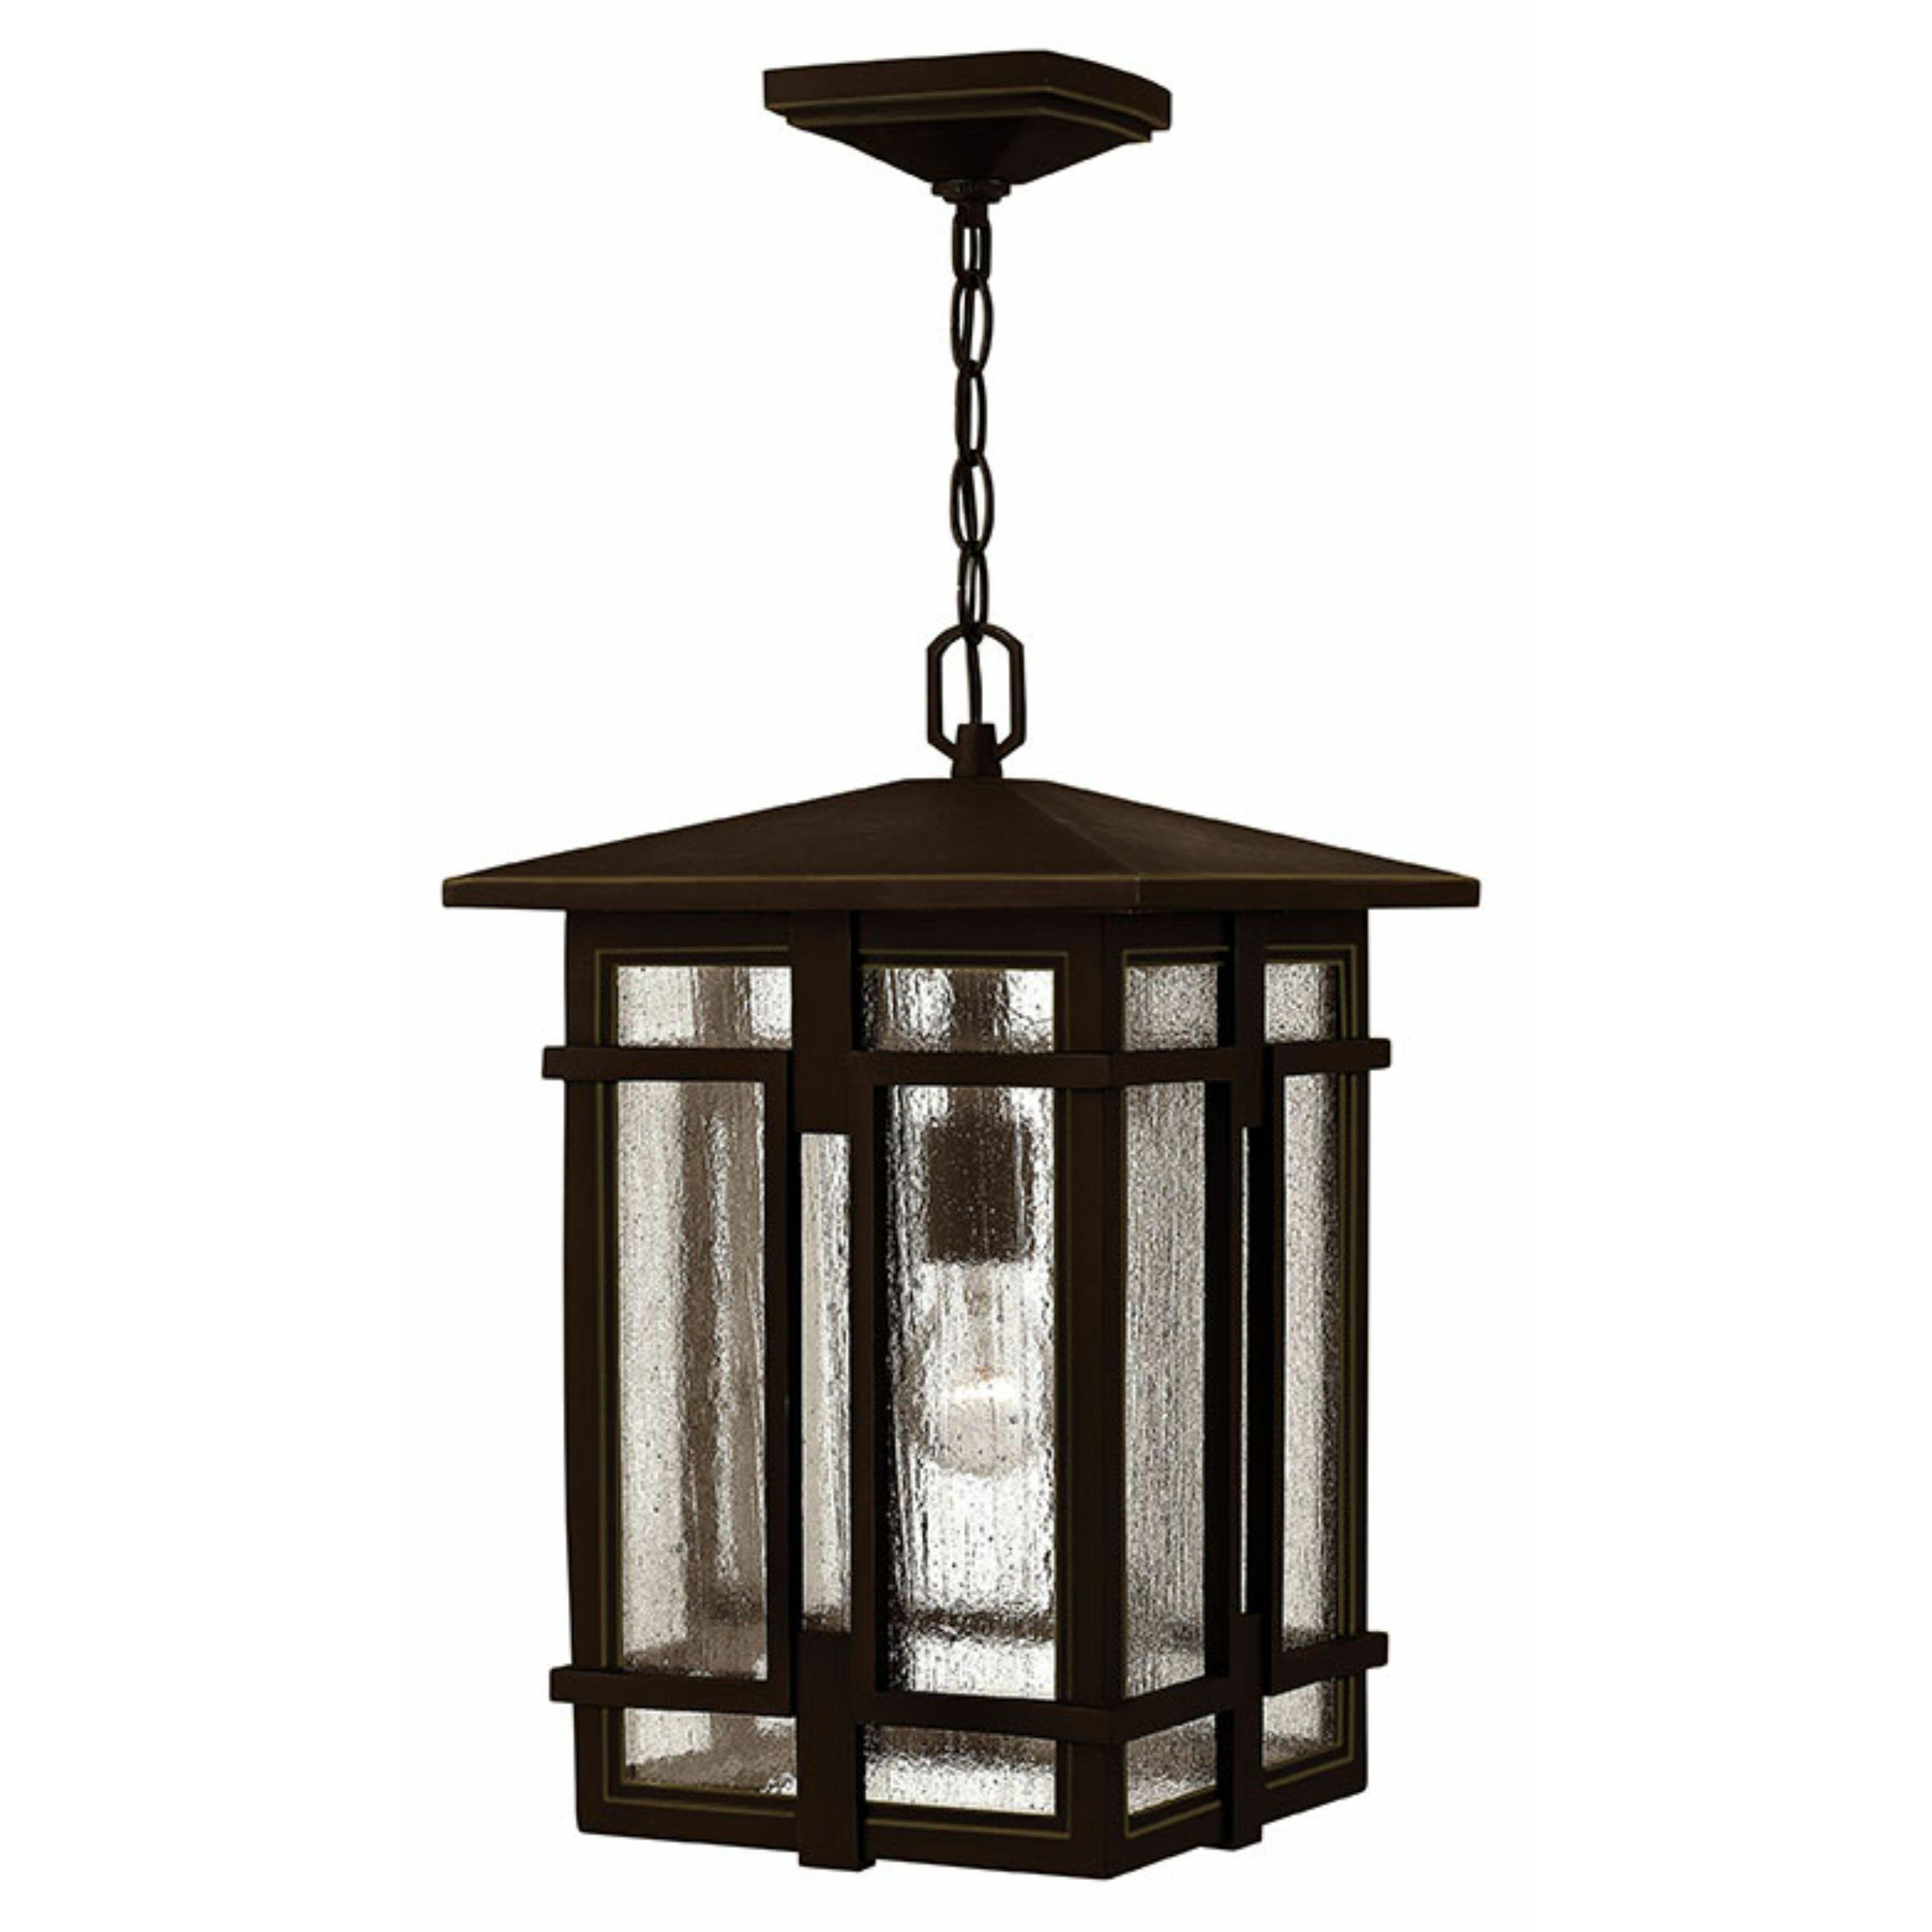 Tucker 1 Light Outdoor Hanging Lantern